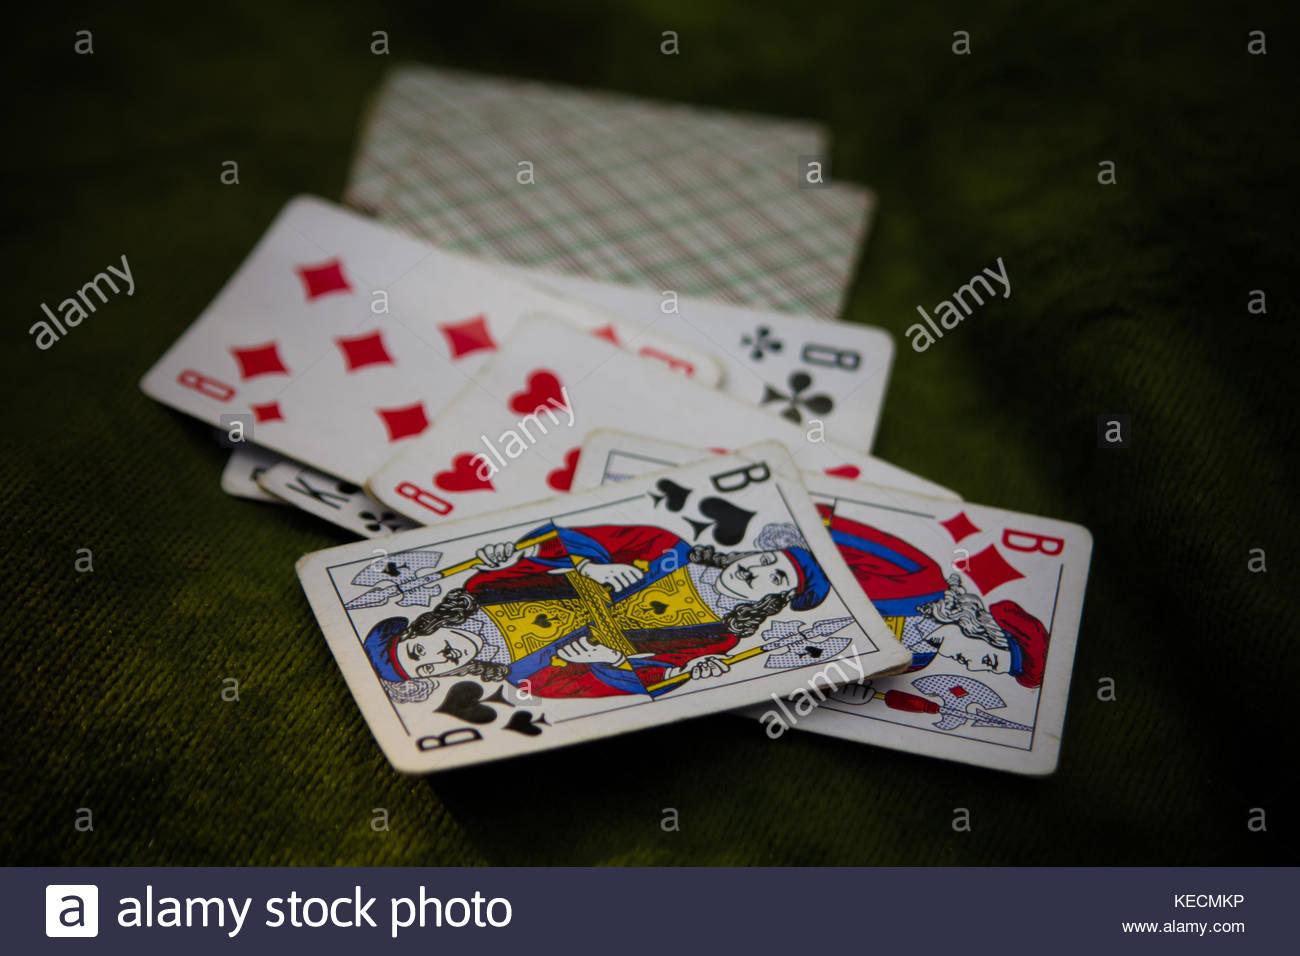 Range Cards Imágenes De Stock & Range Cards Fotos De Stock - Alamy